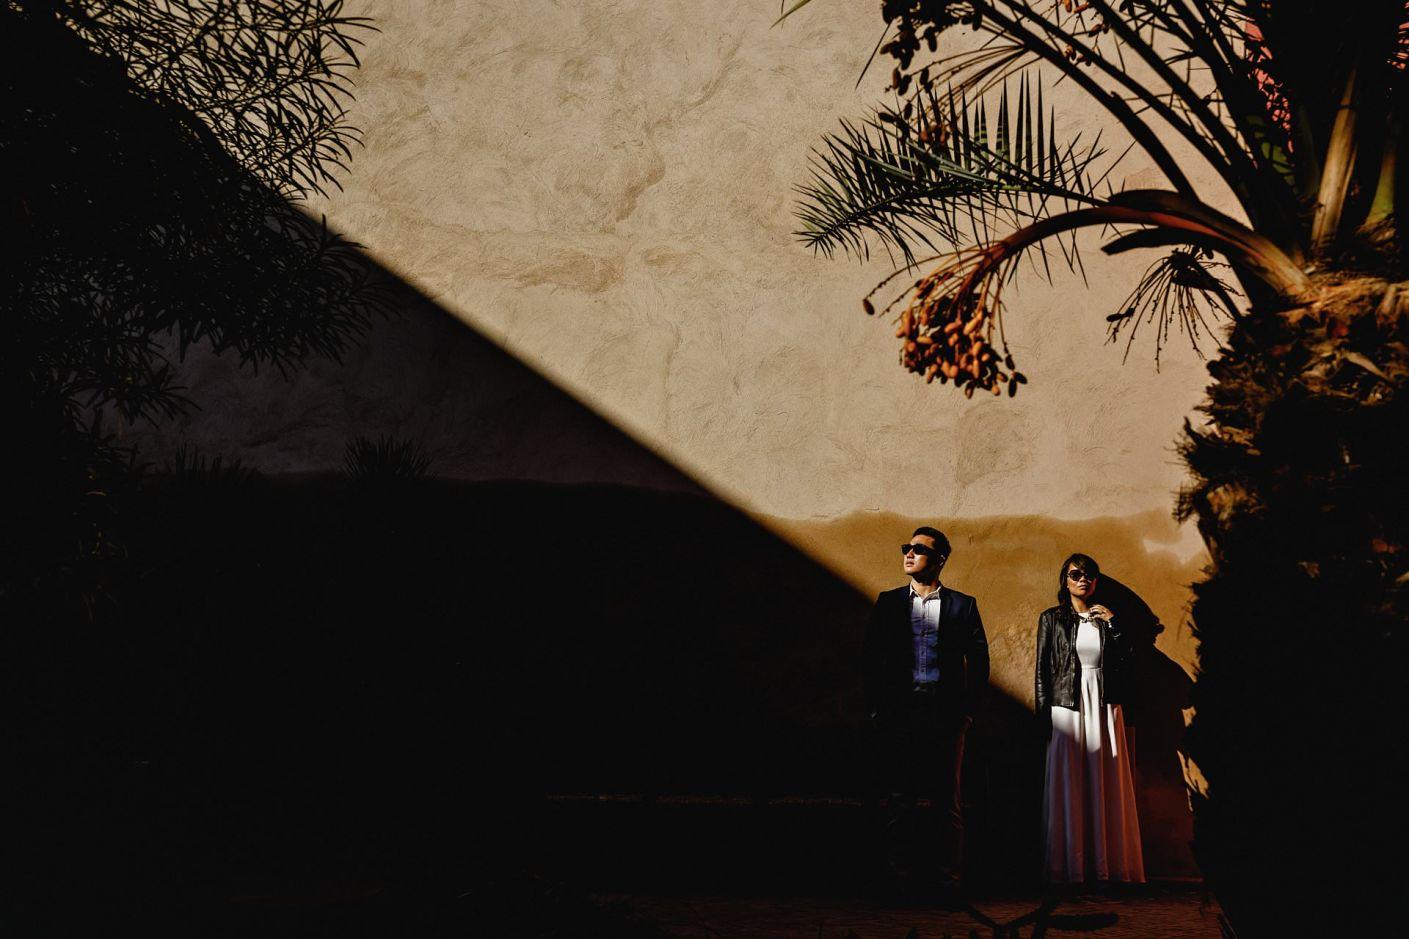 harsh light bride and groom in sunglasses